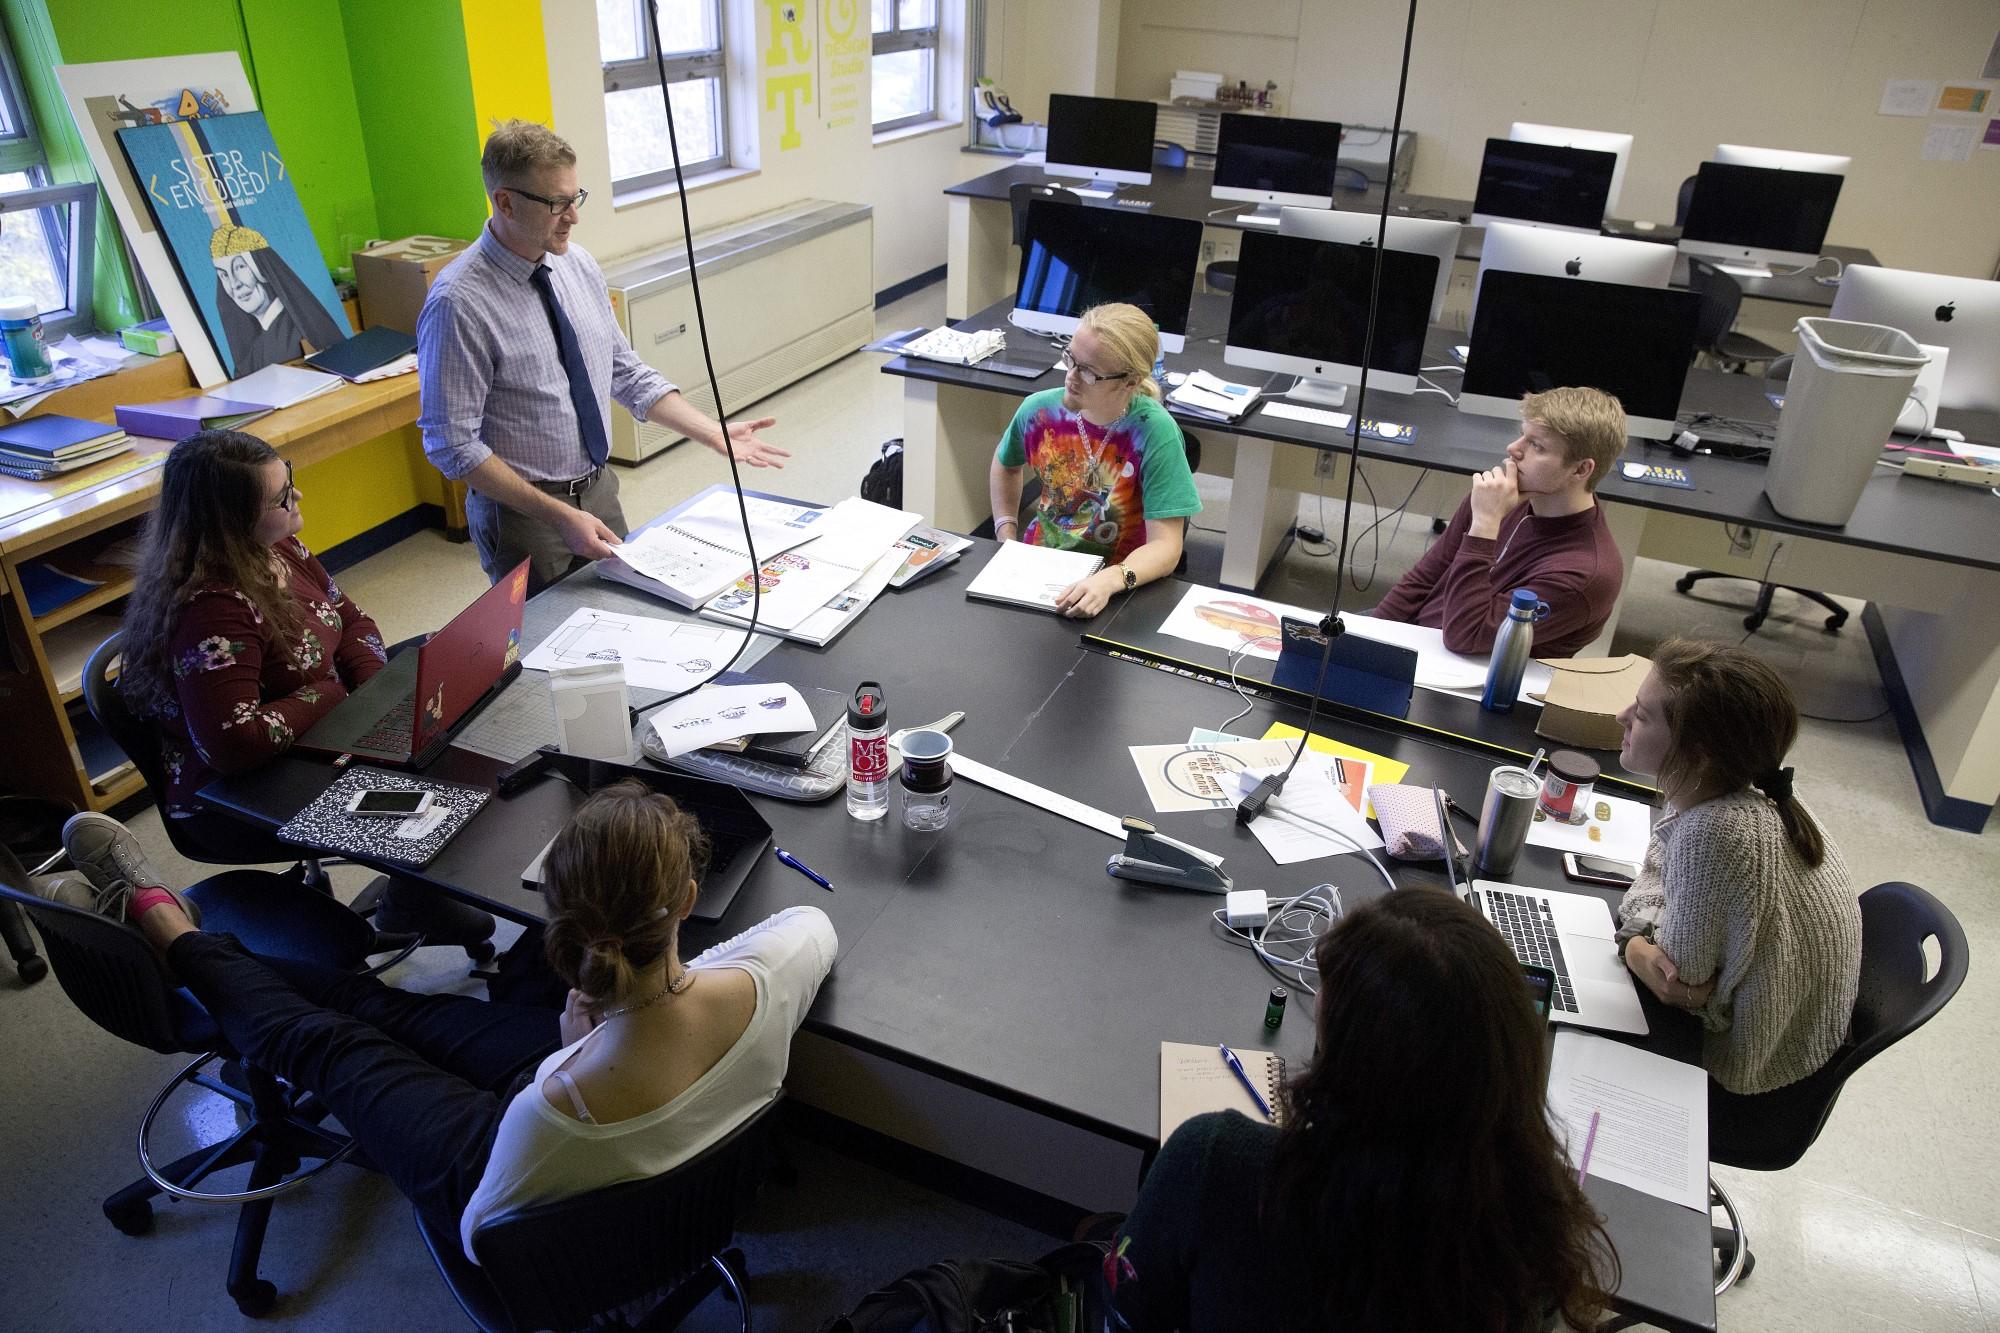 Clarke University Graphic Design Major students in class receiving instruction.